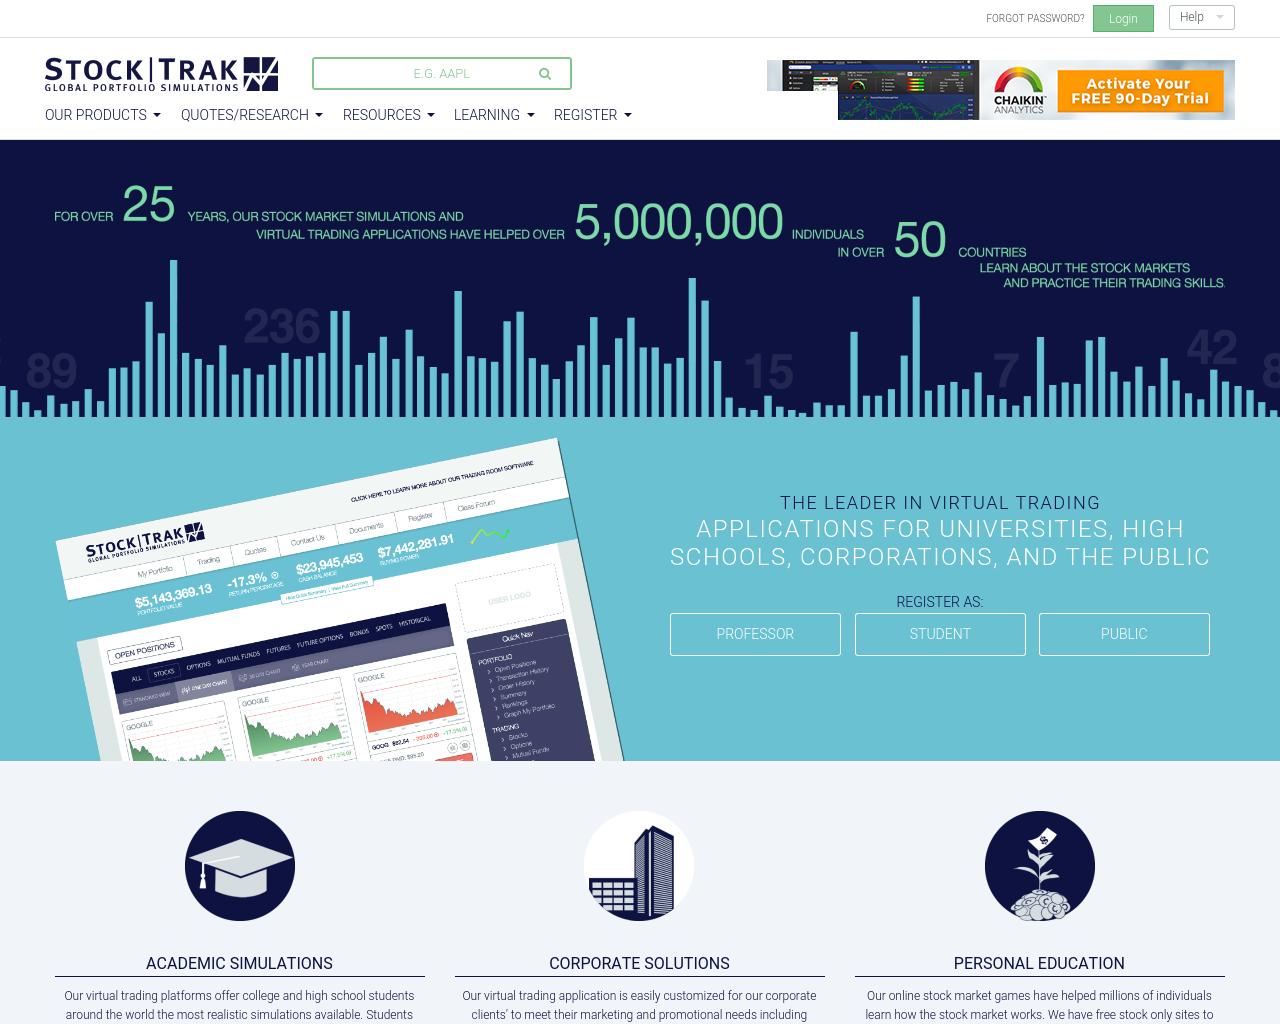 StockTrack-Advertising-Reviews-Pricing